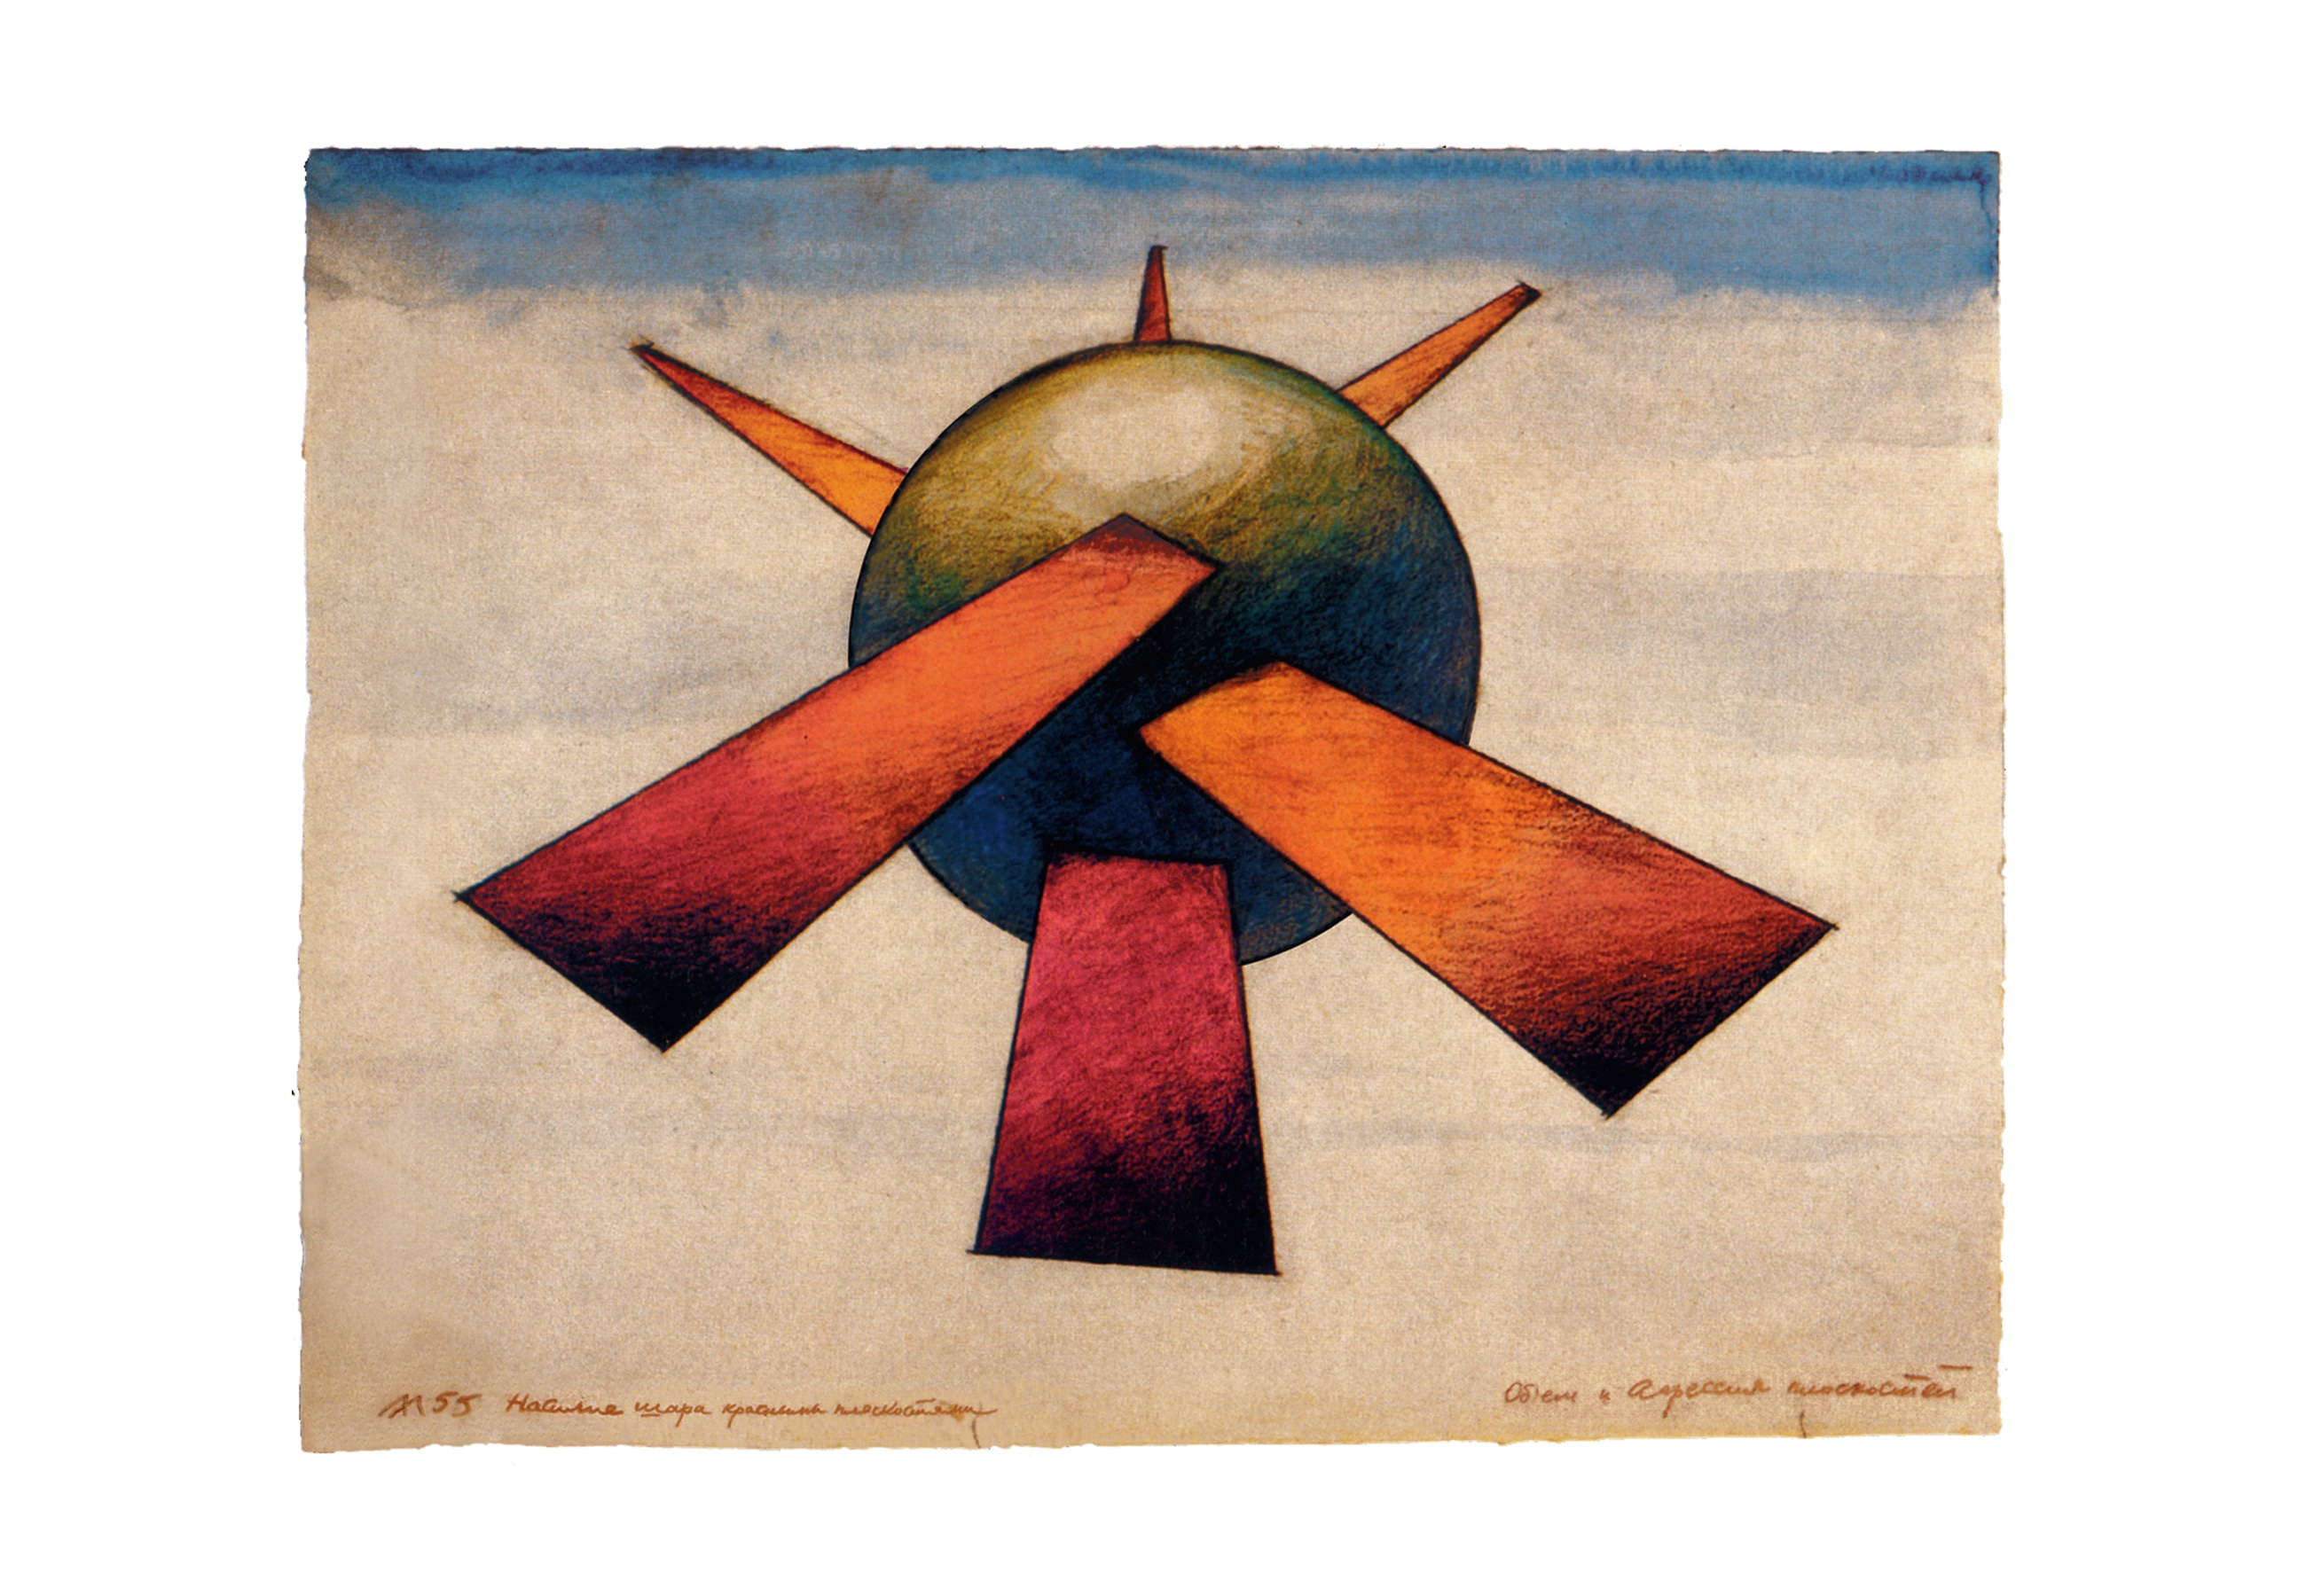 Lamm-Portfolio-1954-1955-34.jpg